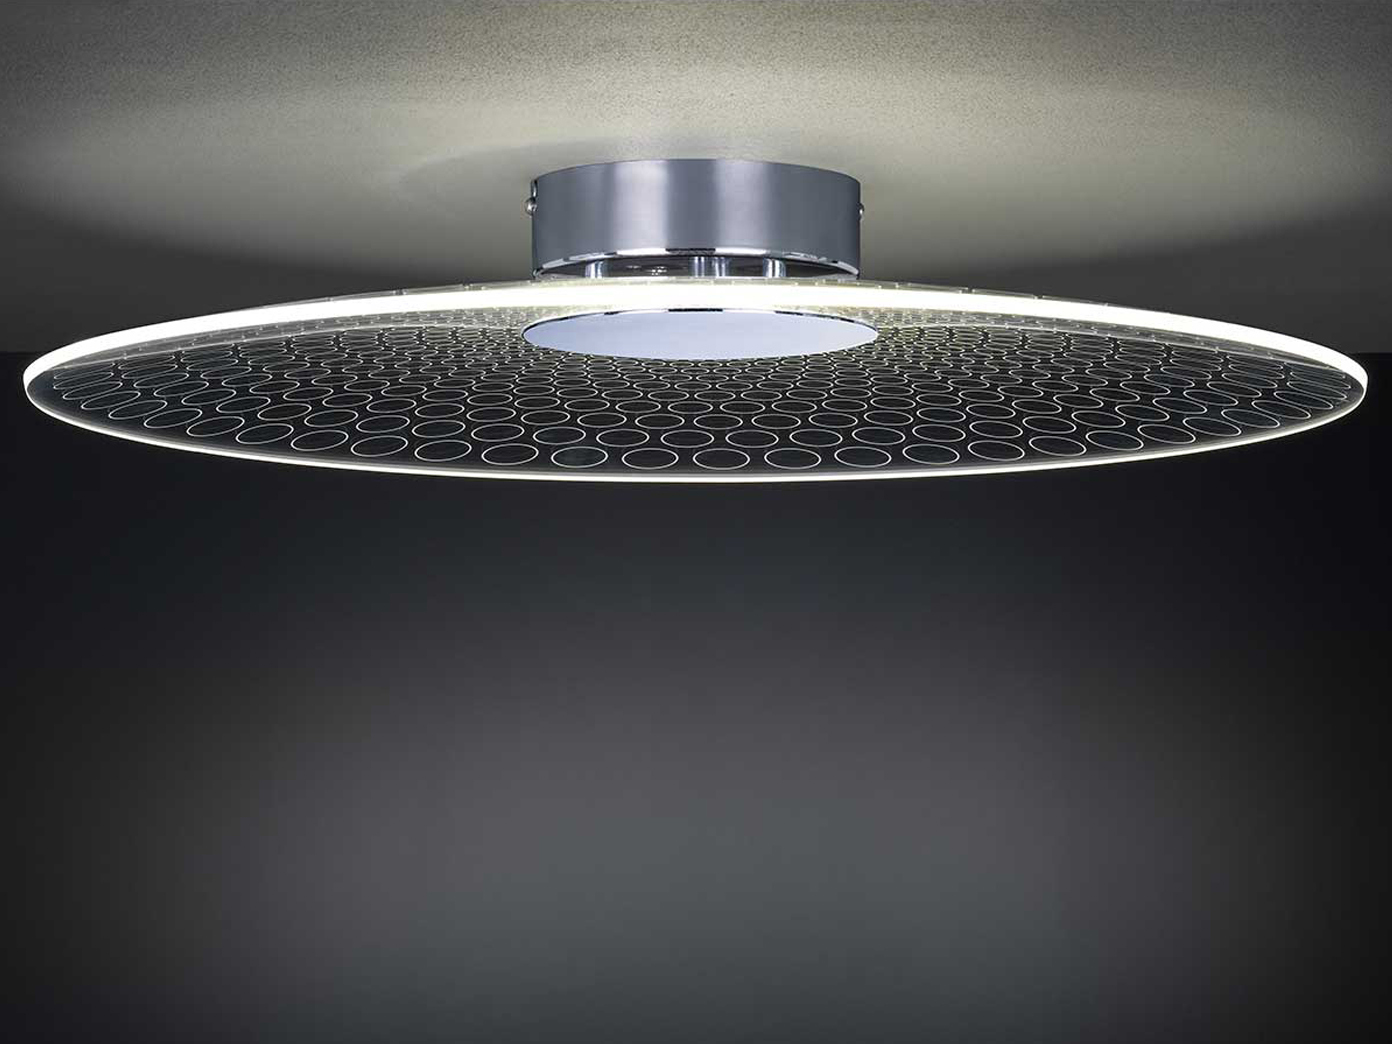 design deckenleuchte 49cm 15 watt led deckenbeleuchtung. Black Bedroom Furniture Sets. Home Design Ideas